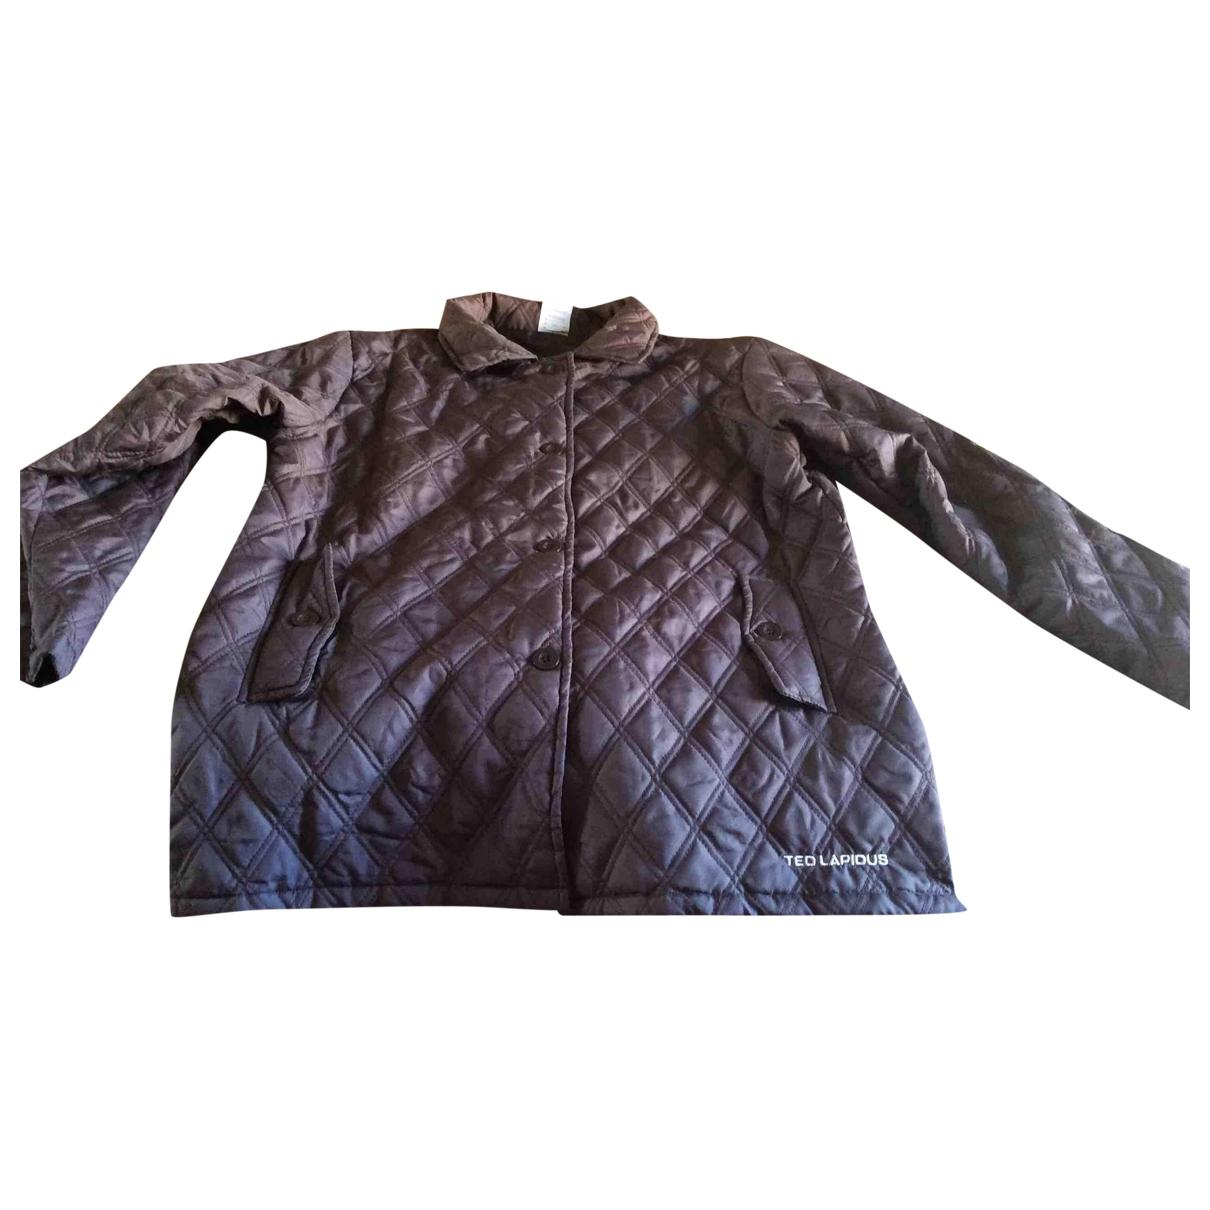 Ted Lapidus \N Brown jacket for Women M International